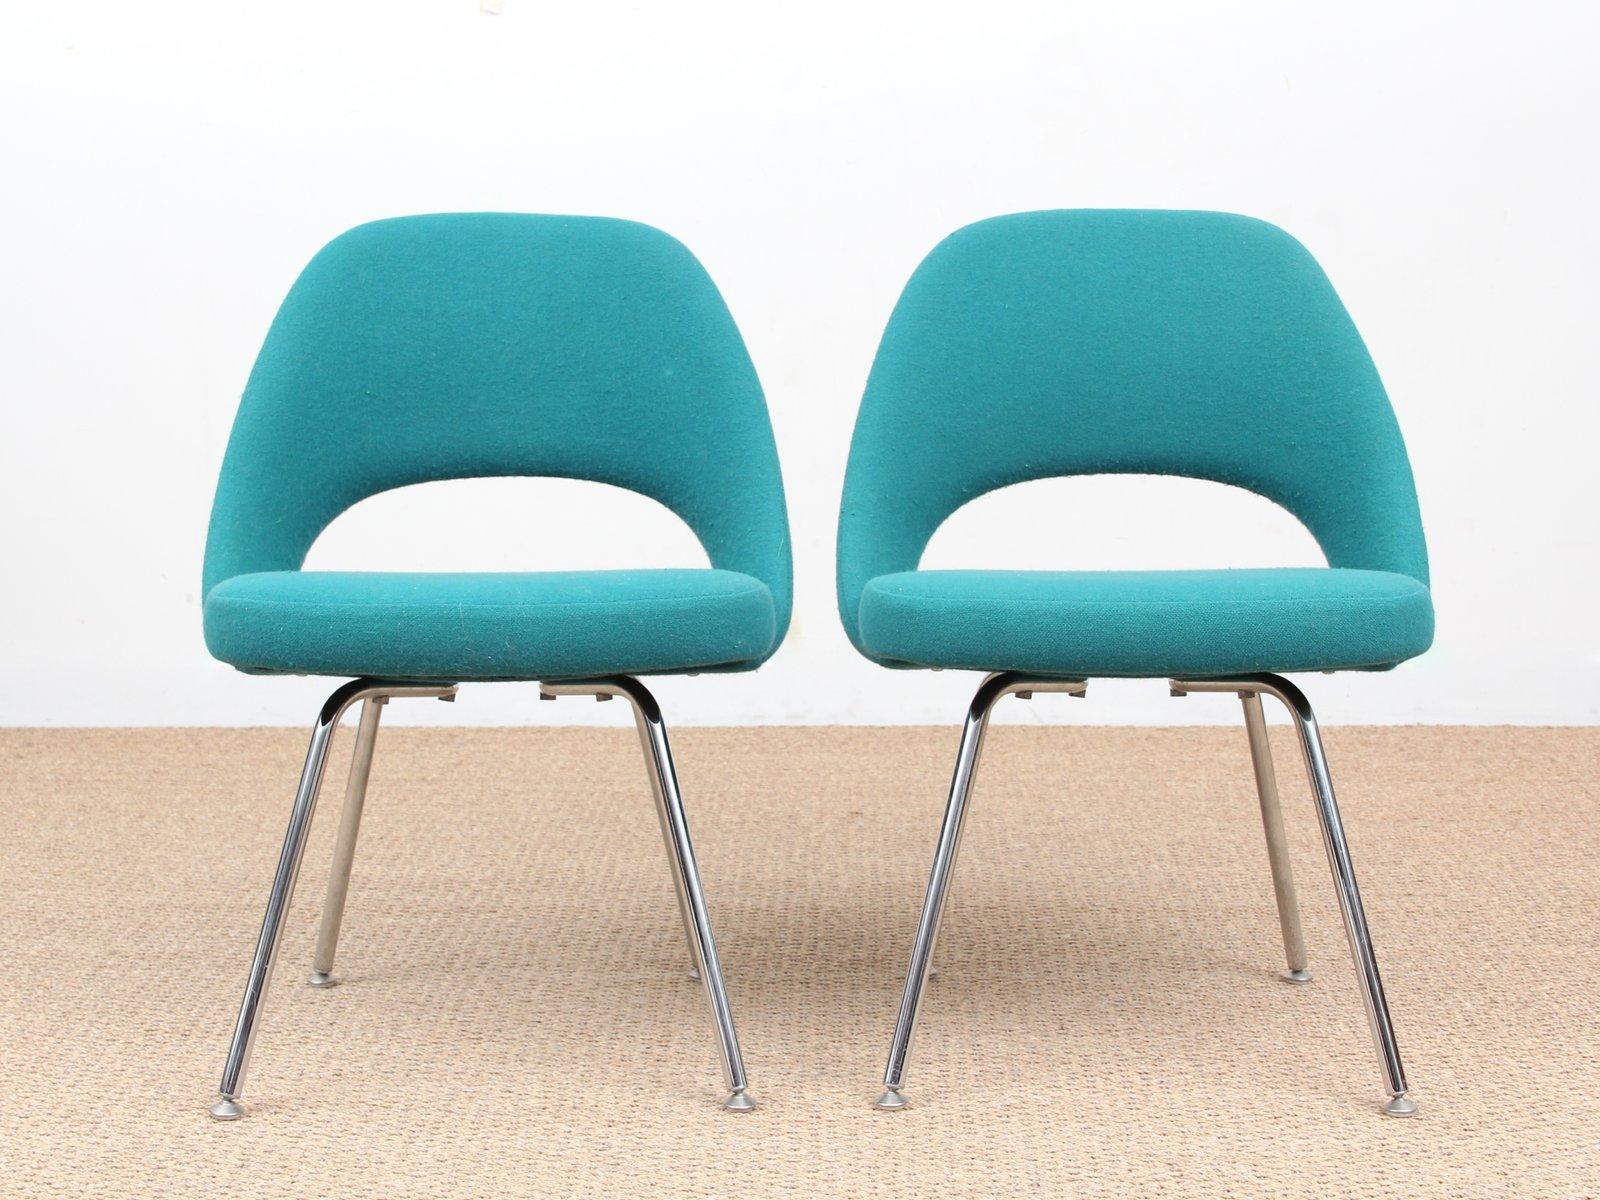 Scandinavian Executive Chairs by Eero Saarinen for Knoll 1950s